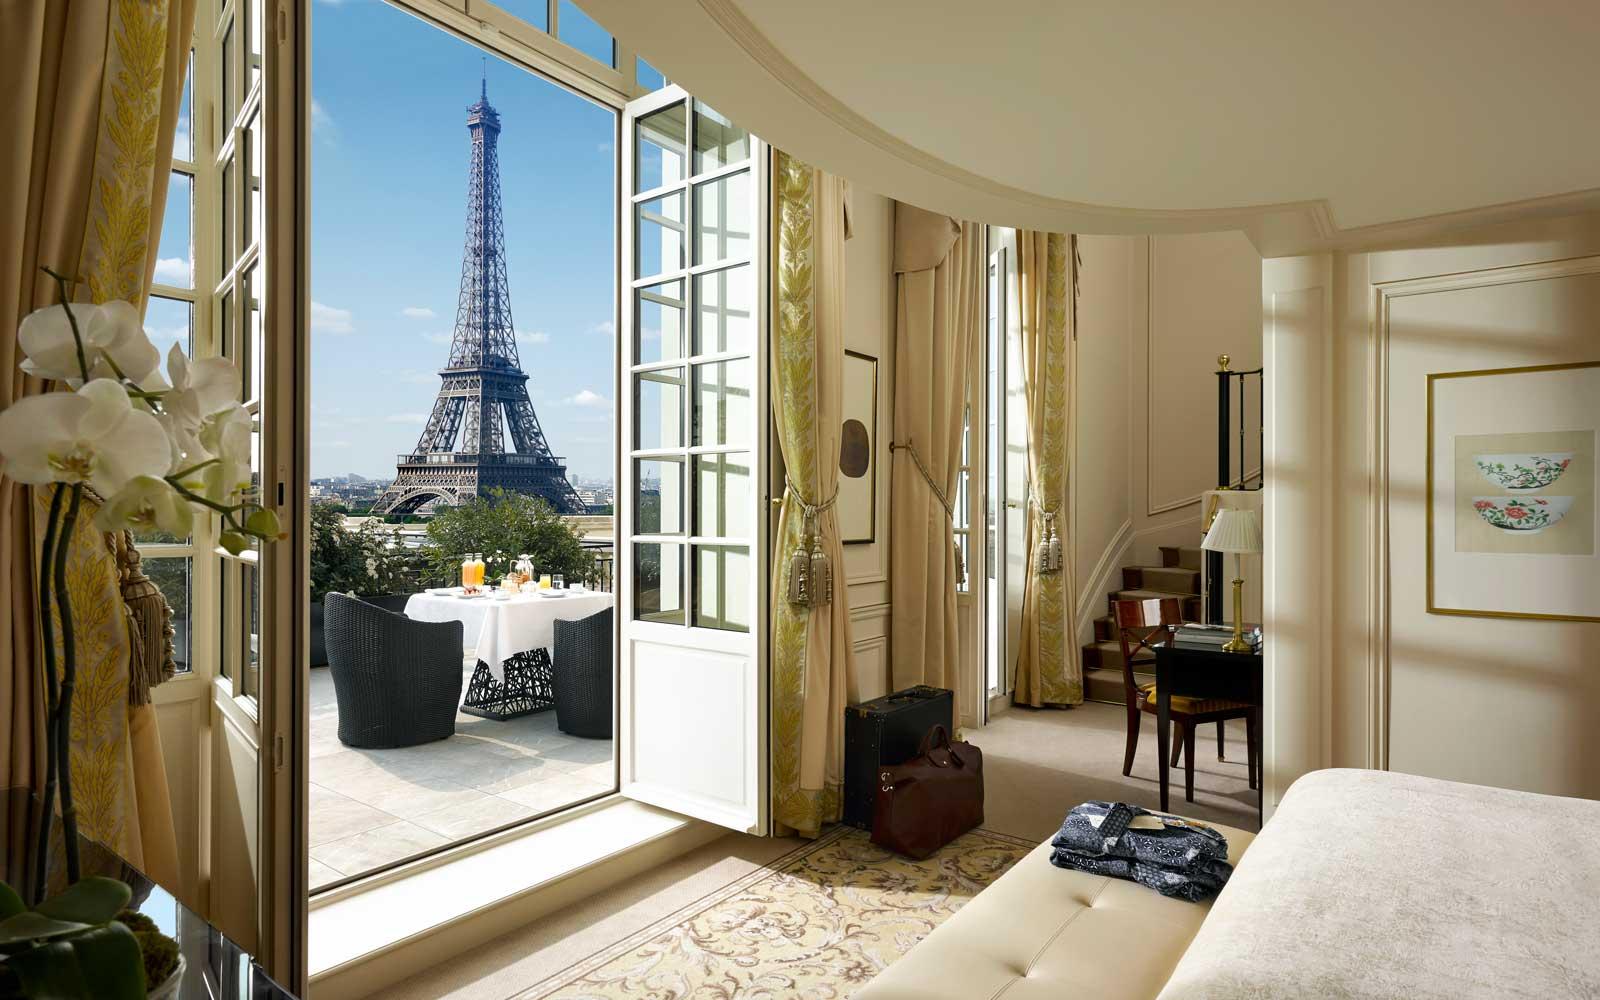 Best Spa Hotels in Paris